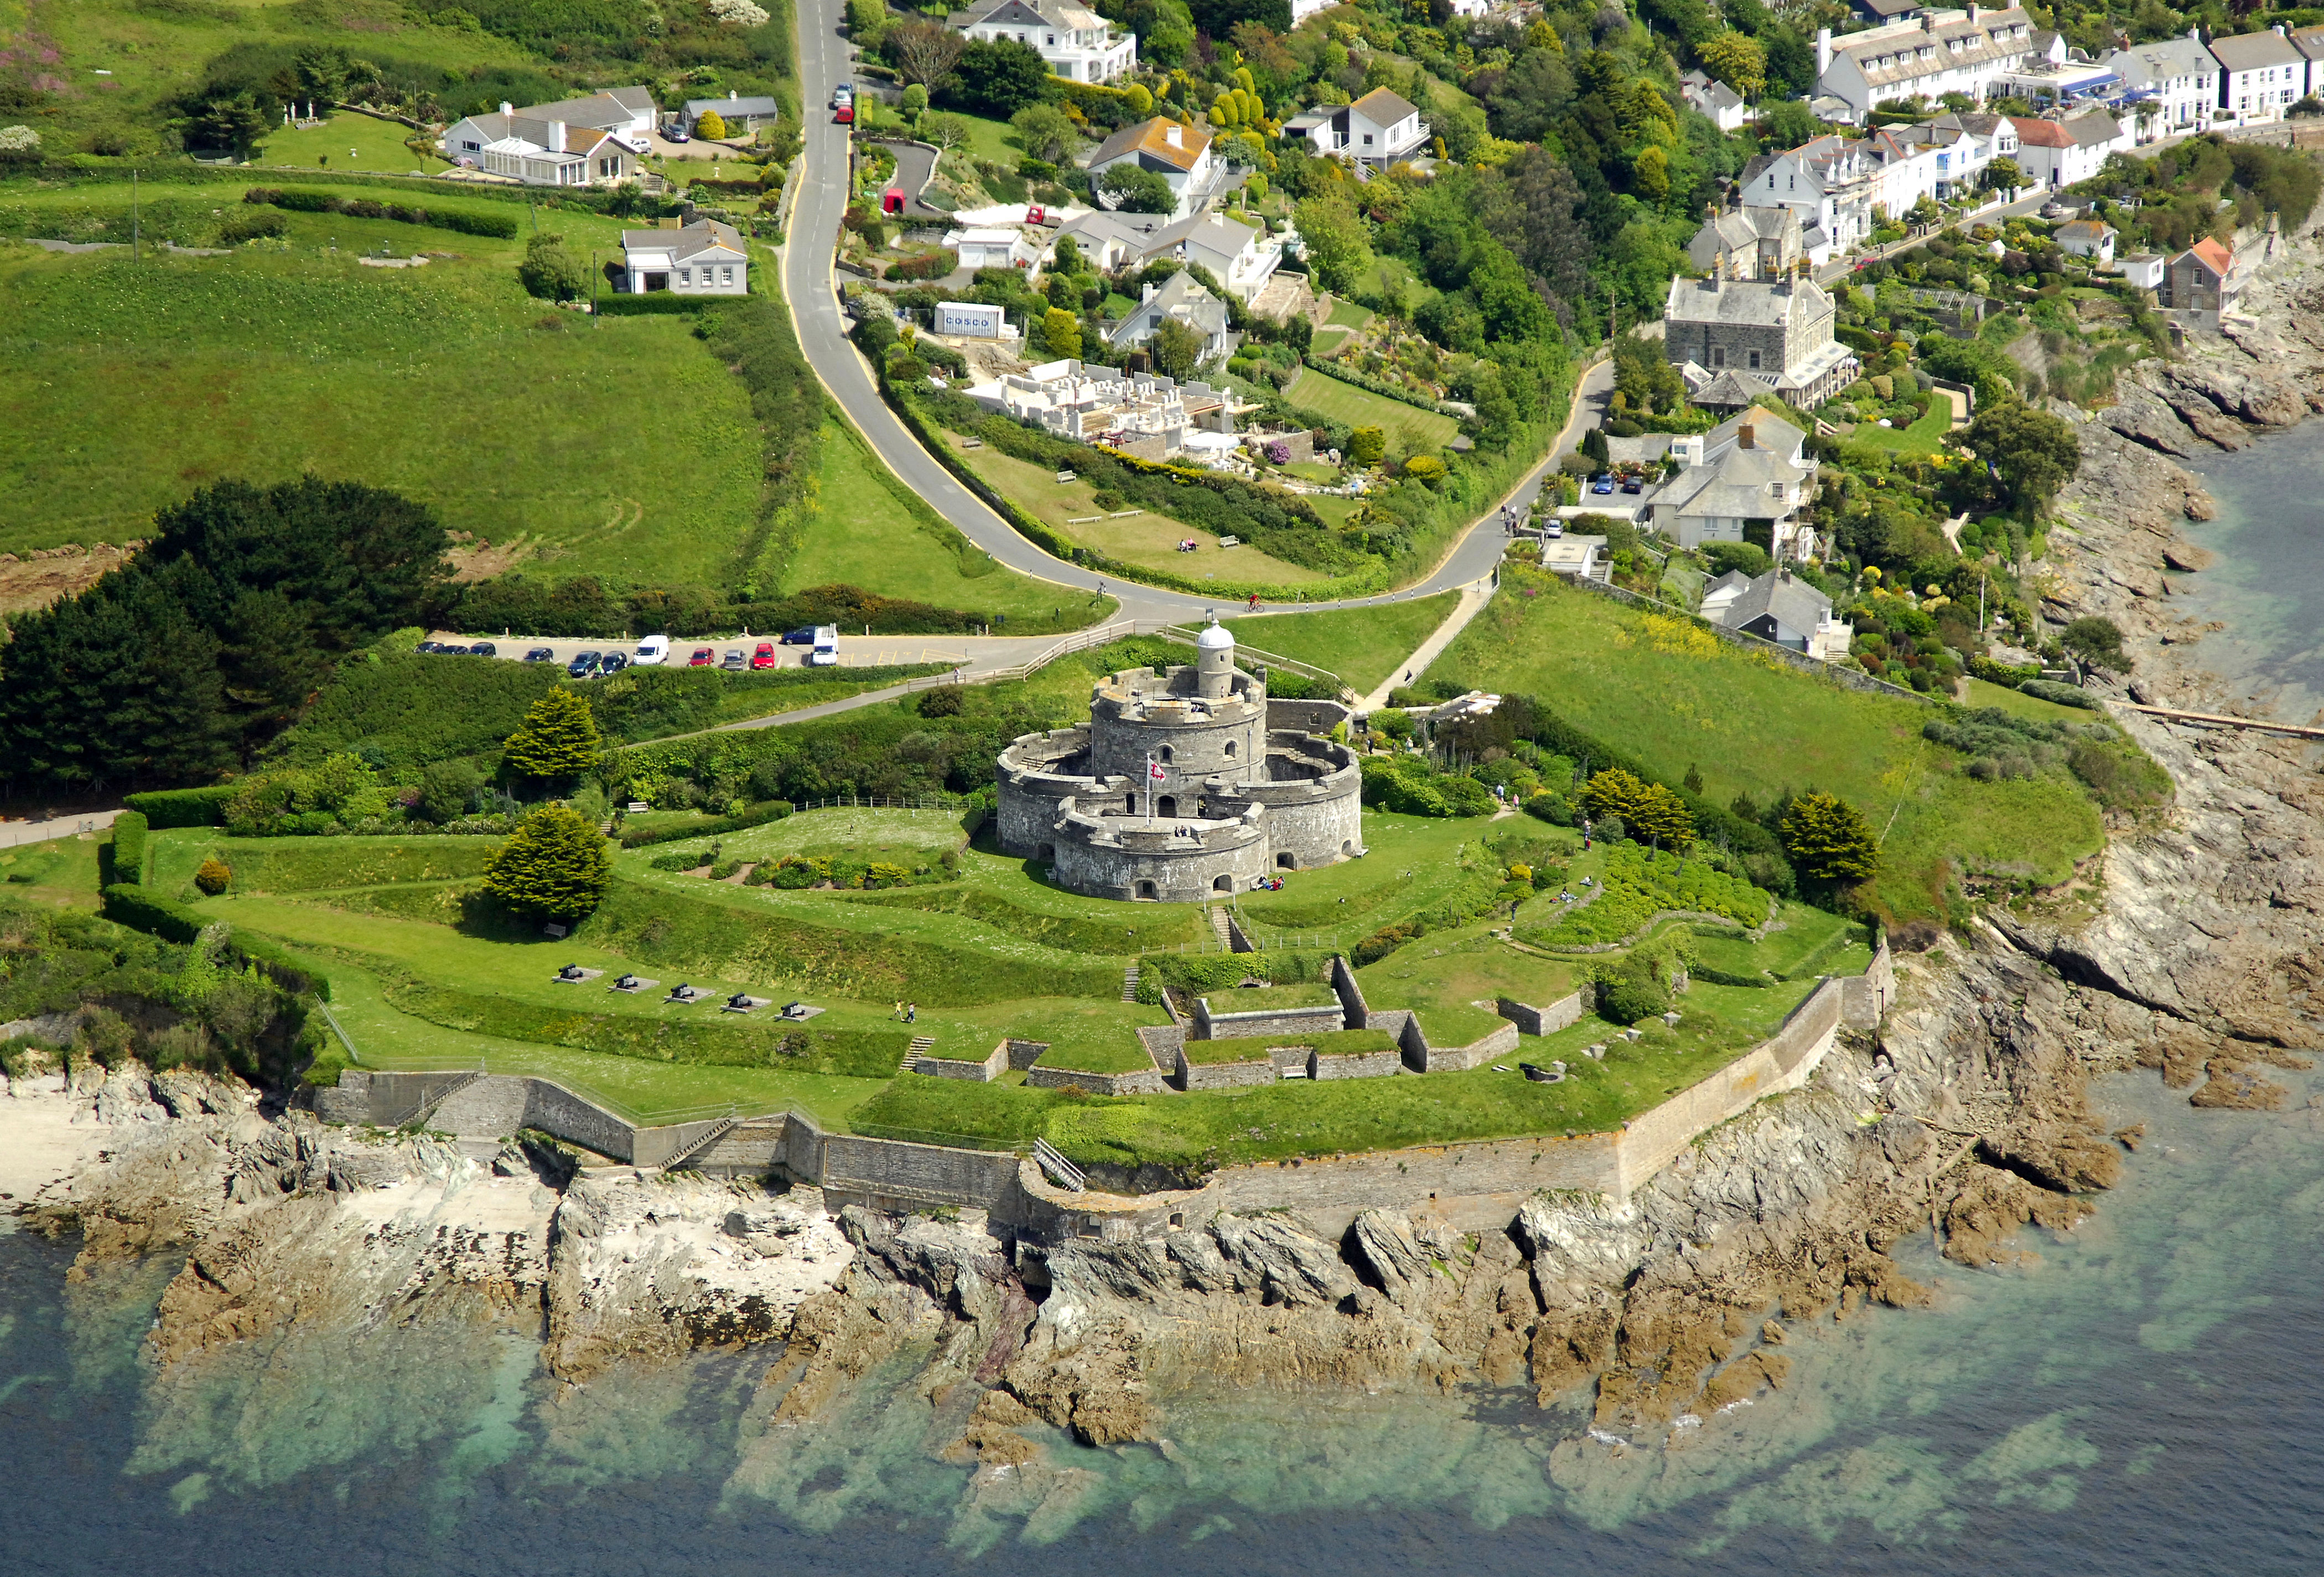 St Mawes Castle Landmark In St Mawes Cornwall Gb United